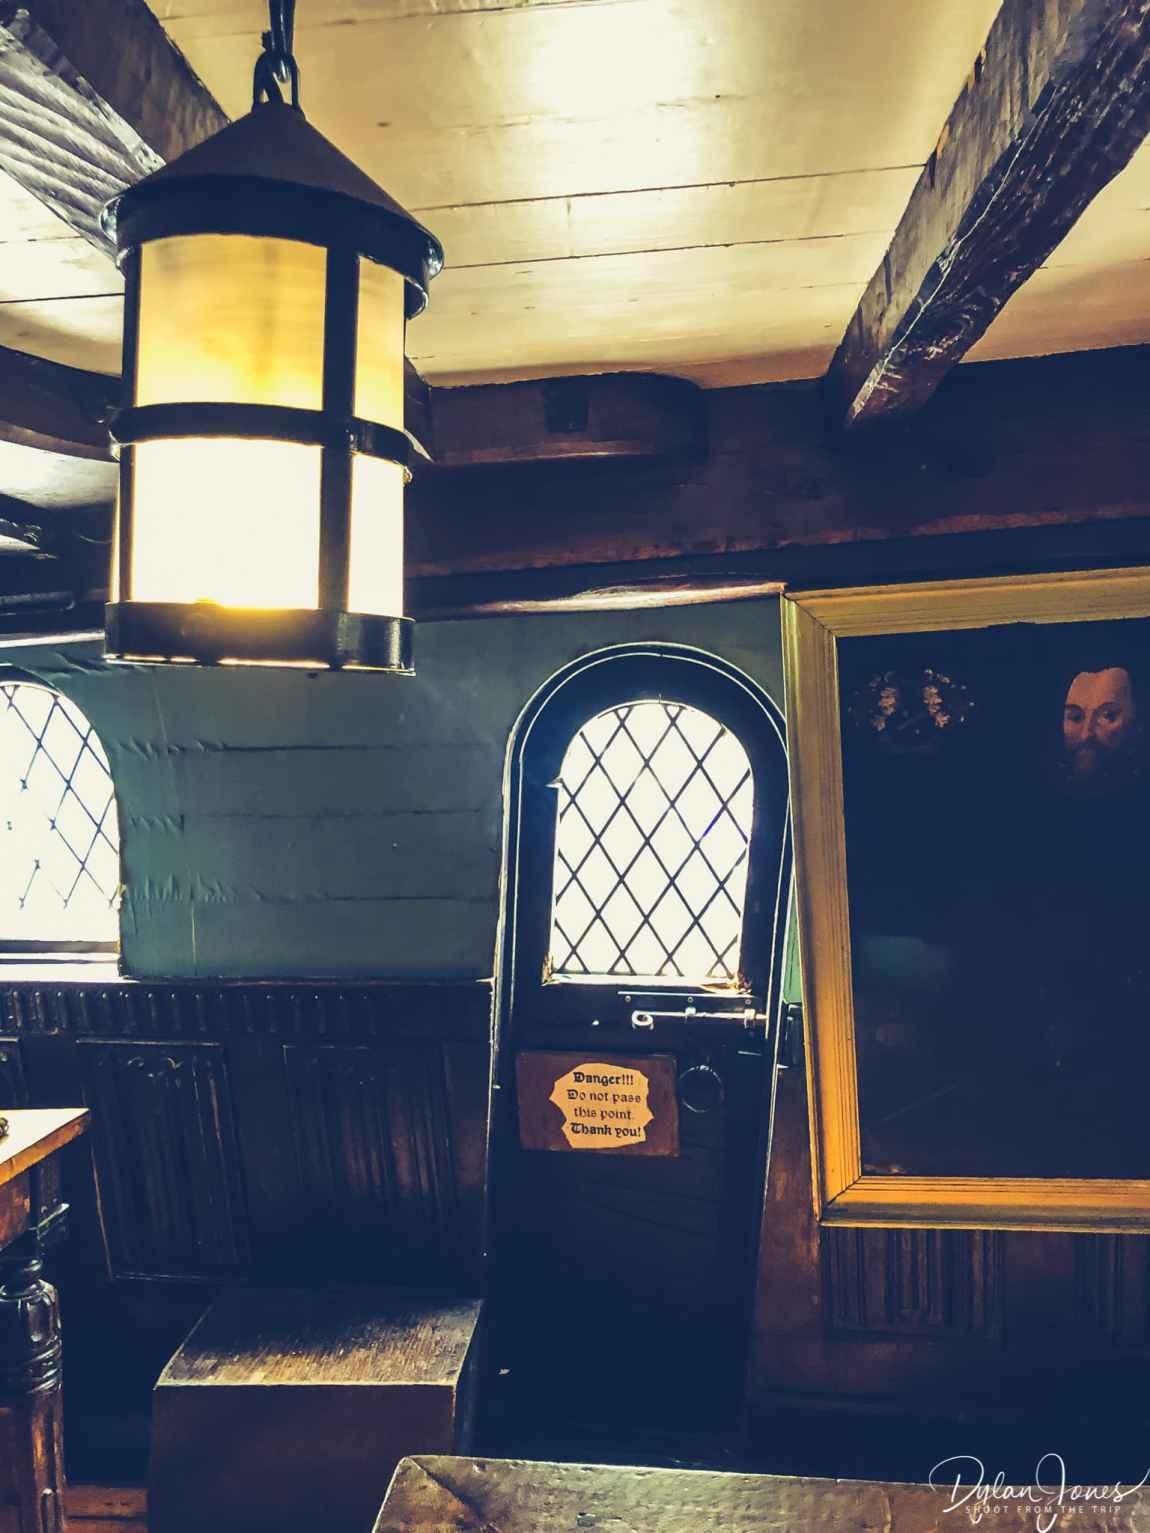 Interior shot of The Golden Hinde